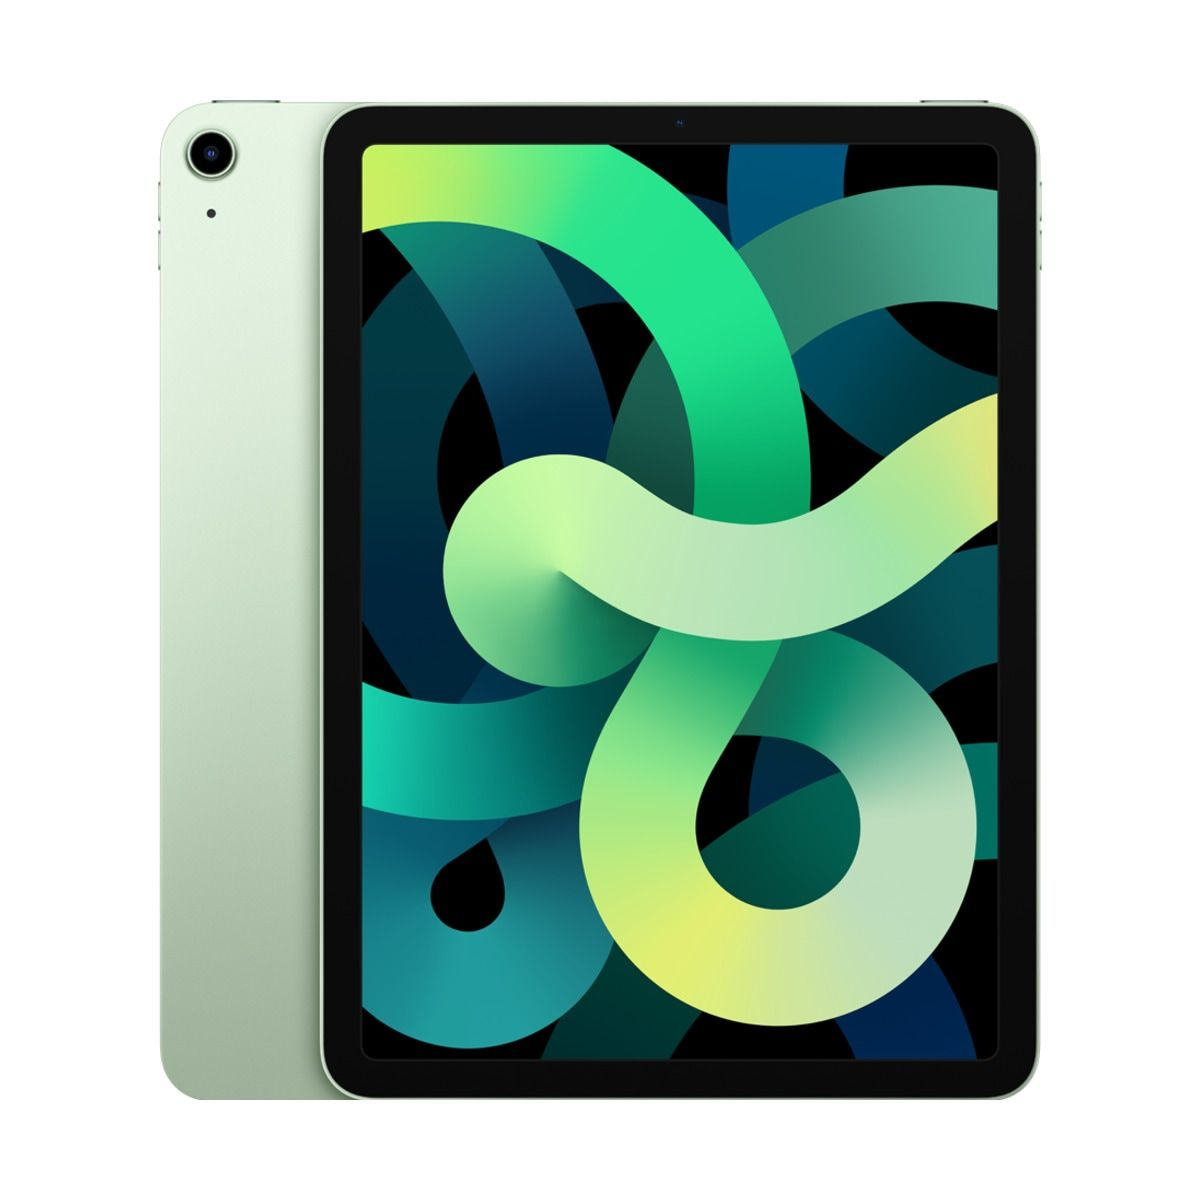 Apple iPad Air Wi-Fi+Cell 256GB - Green